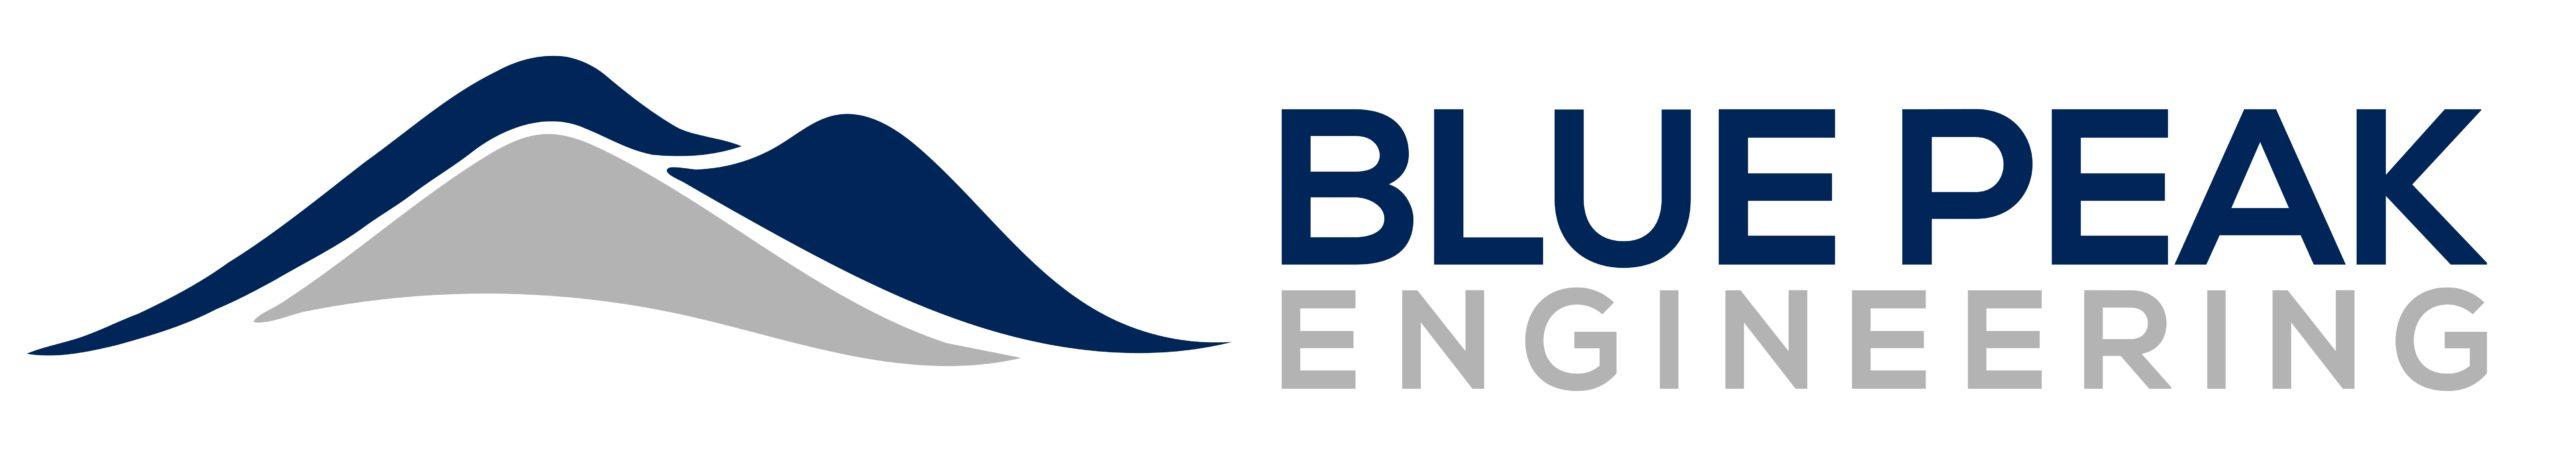 Blue Peak Engineering